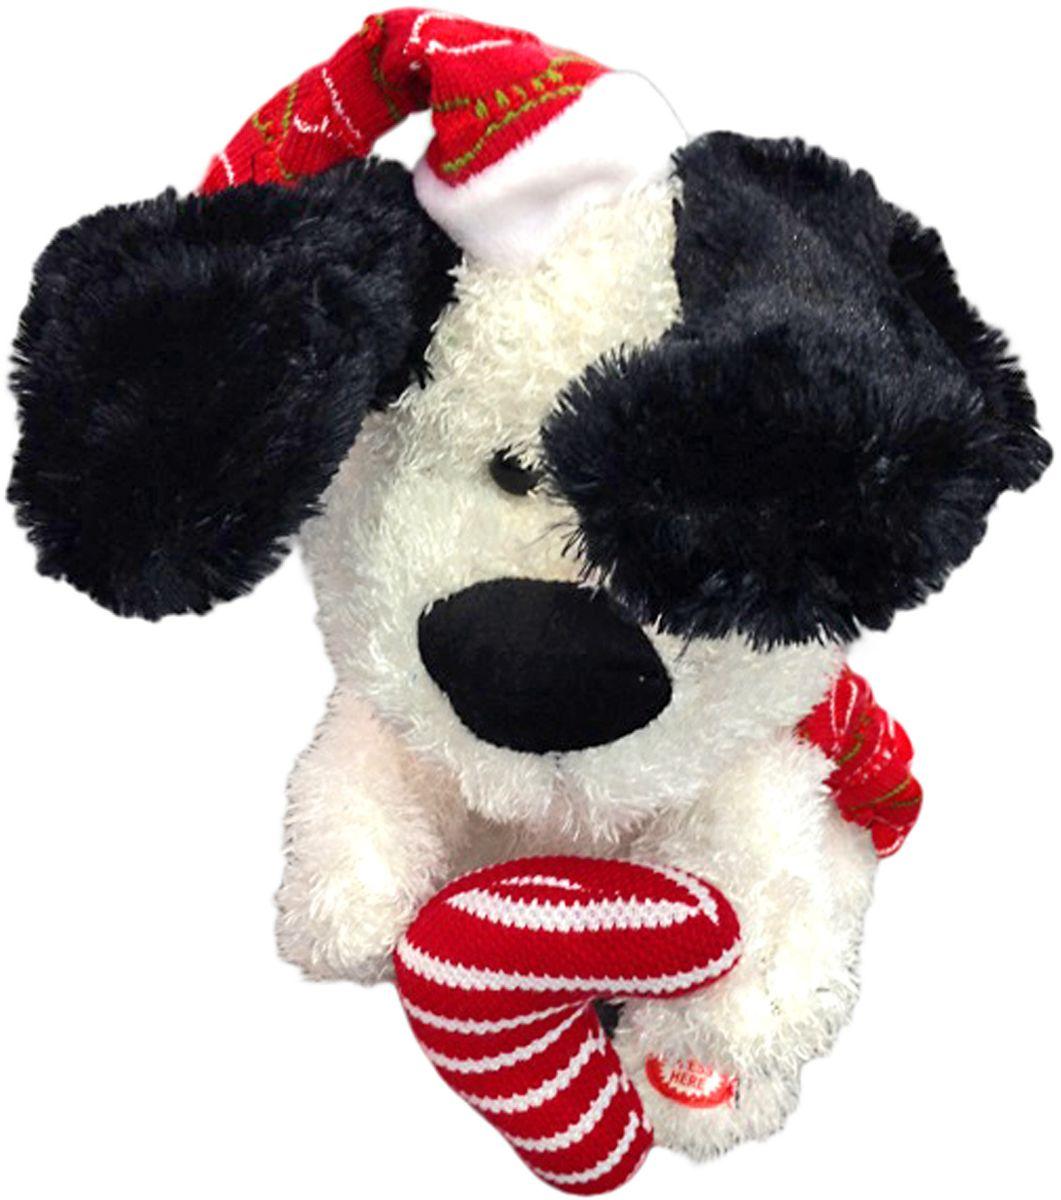 Lapa House Мягкая озвученная игрушка Собачка 26 см 53287